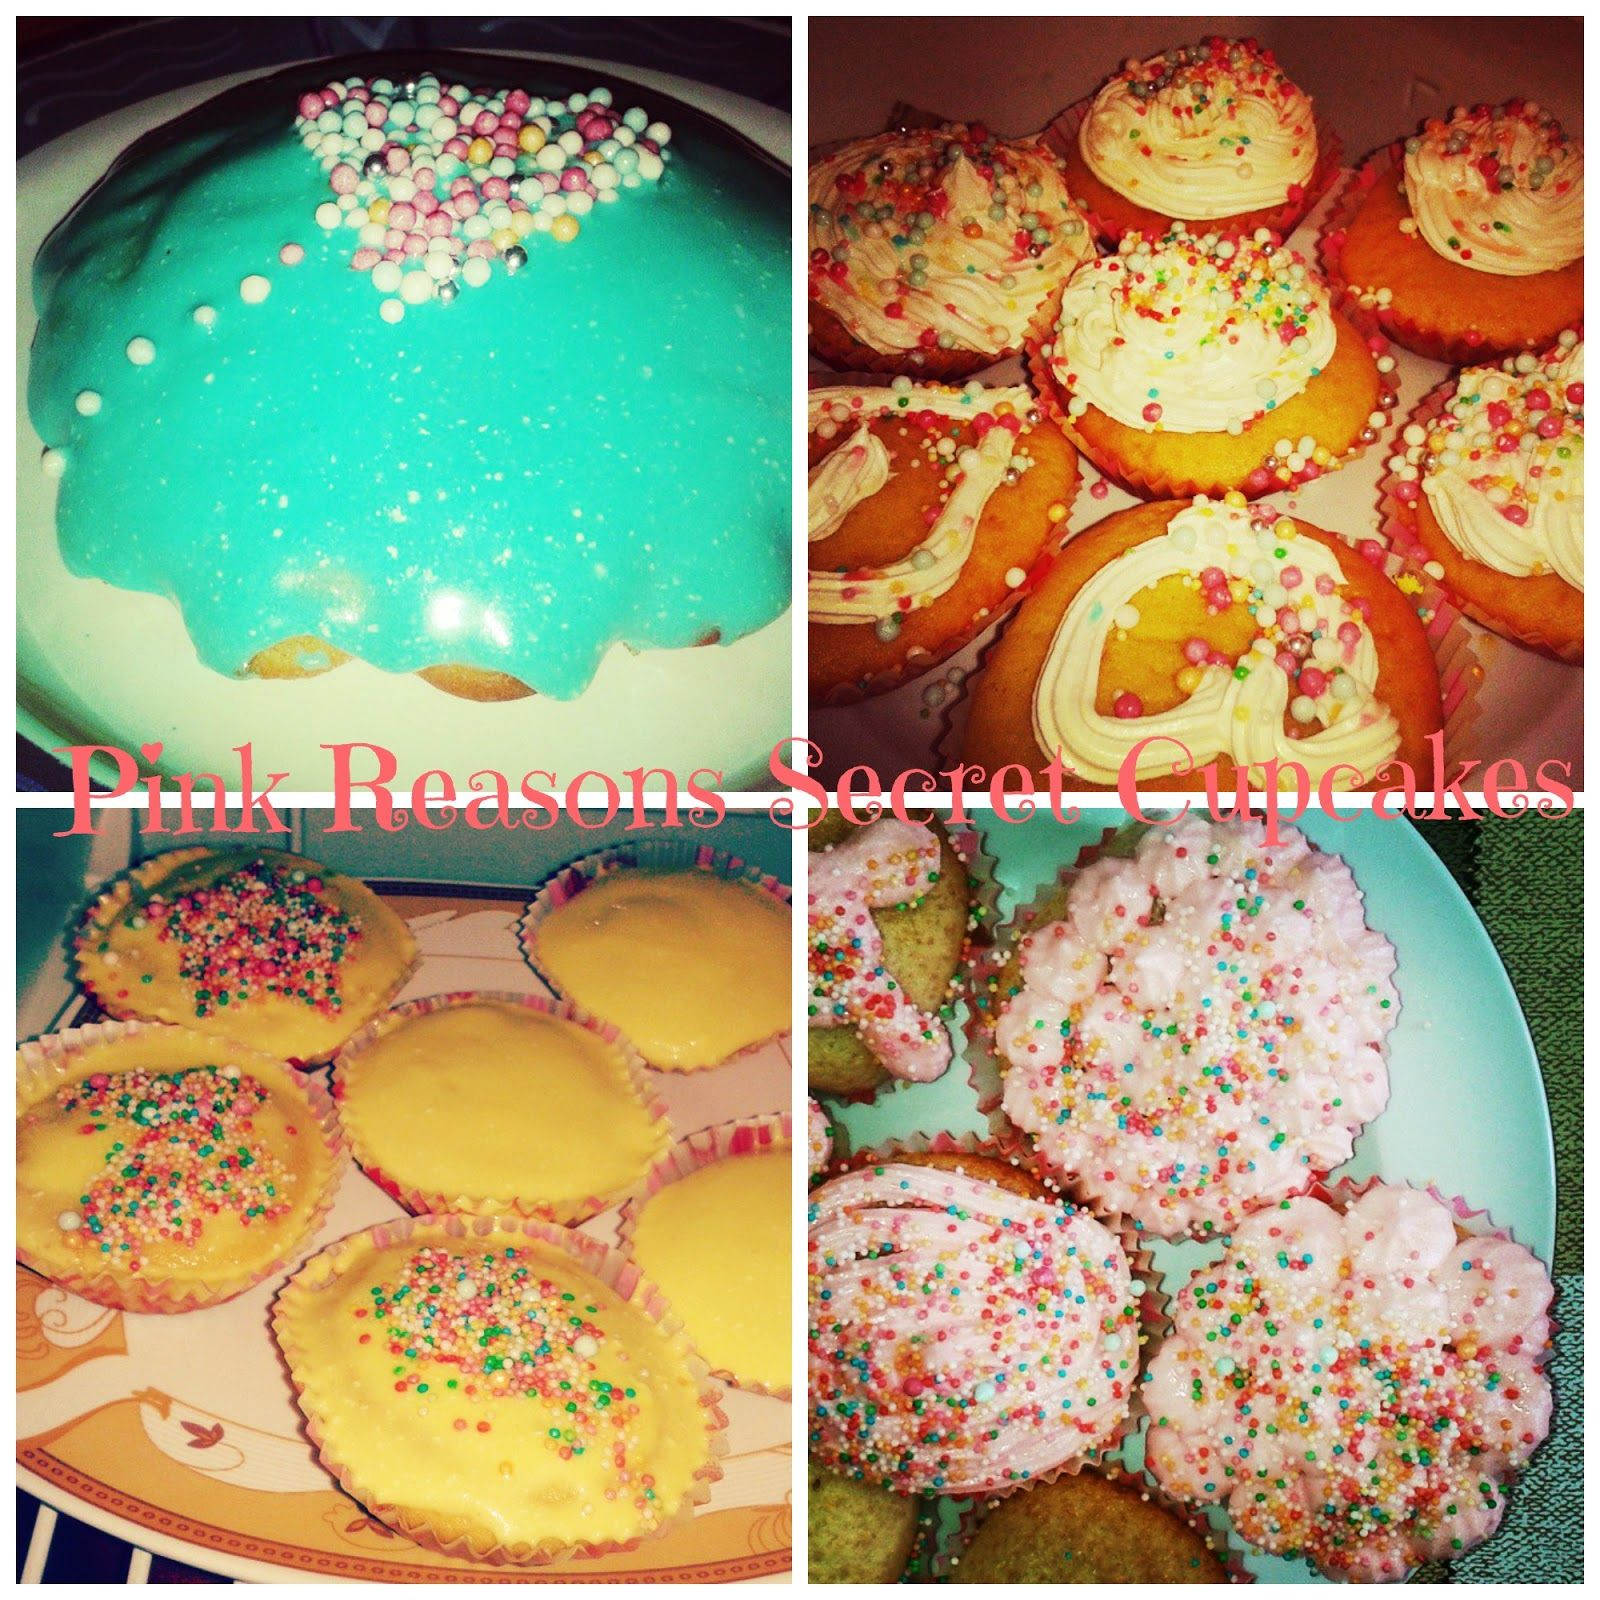 Pink Reasons: Amazing Super Easy Vanilla Cupcakes!!!